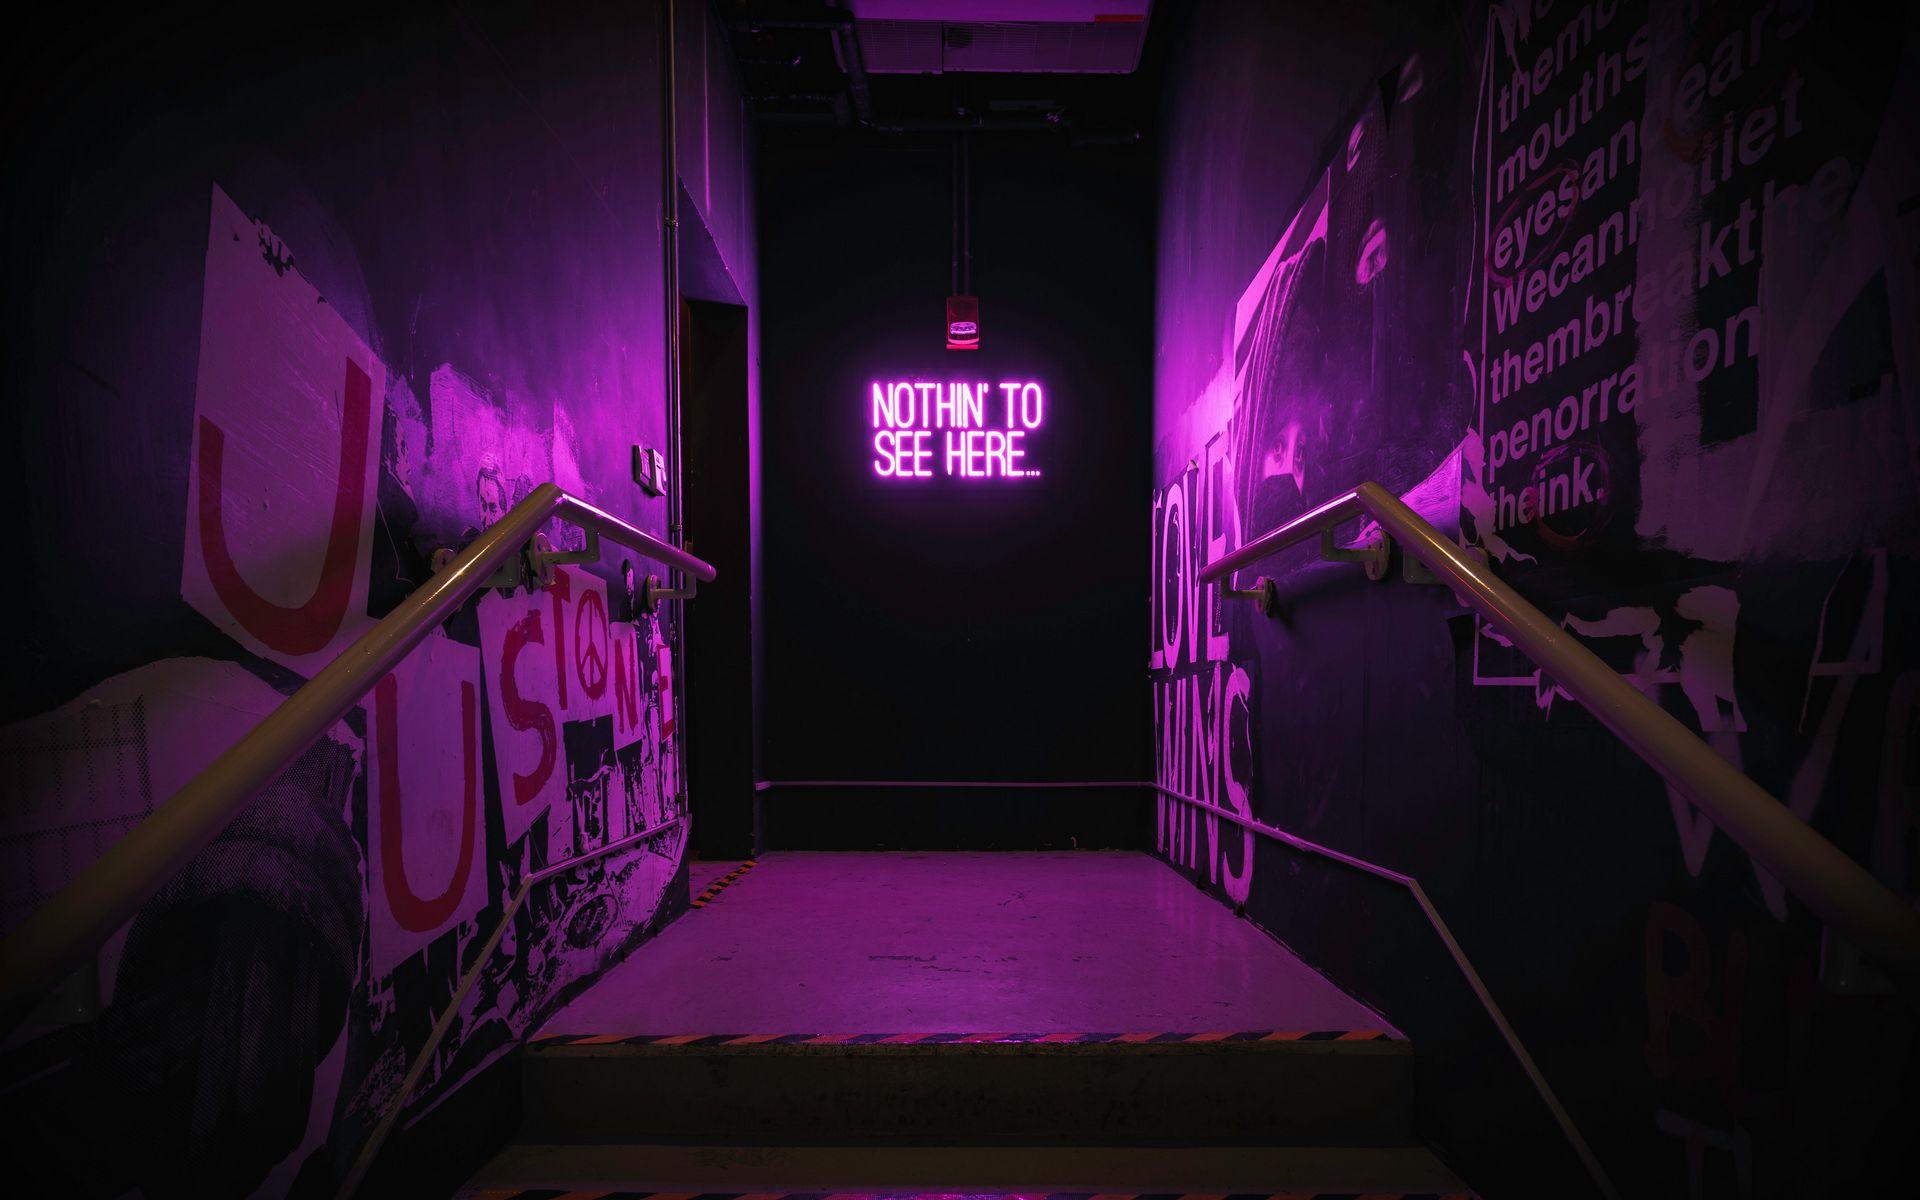 1920x1200 Wallpaper neon, inscription, wall, purple, backlight